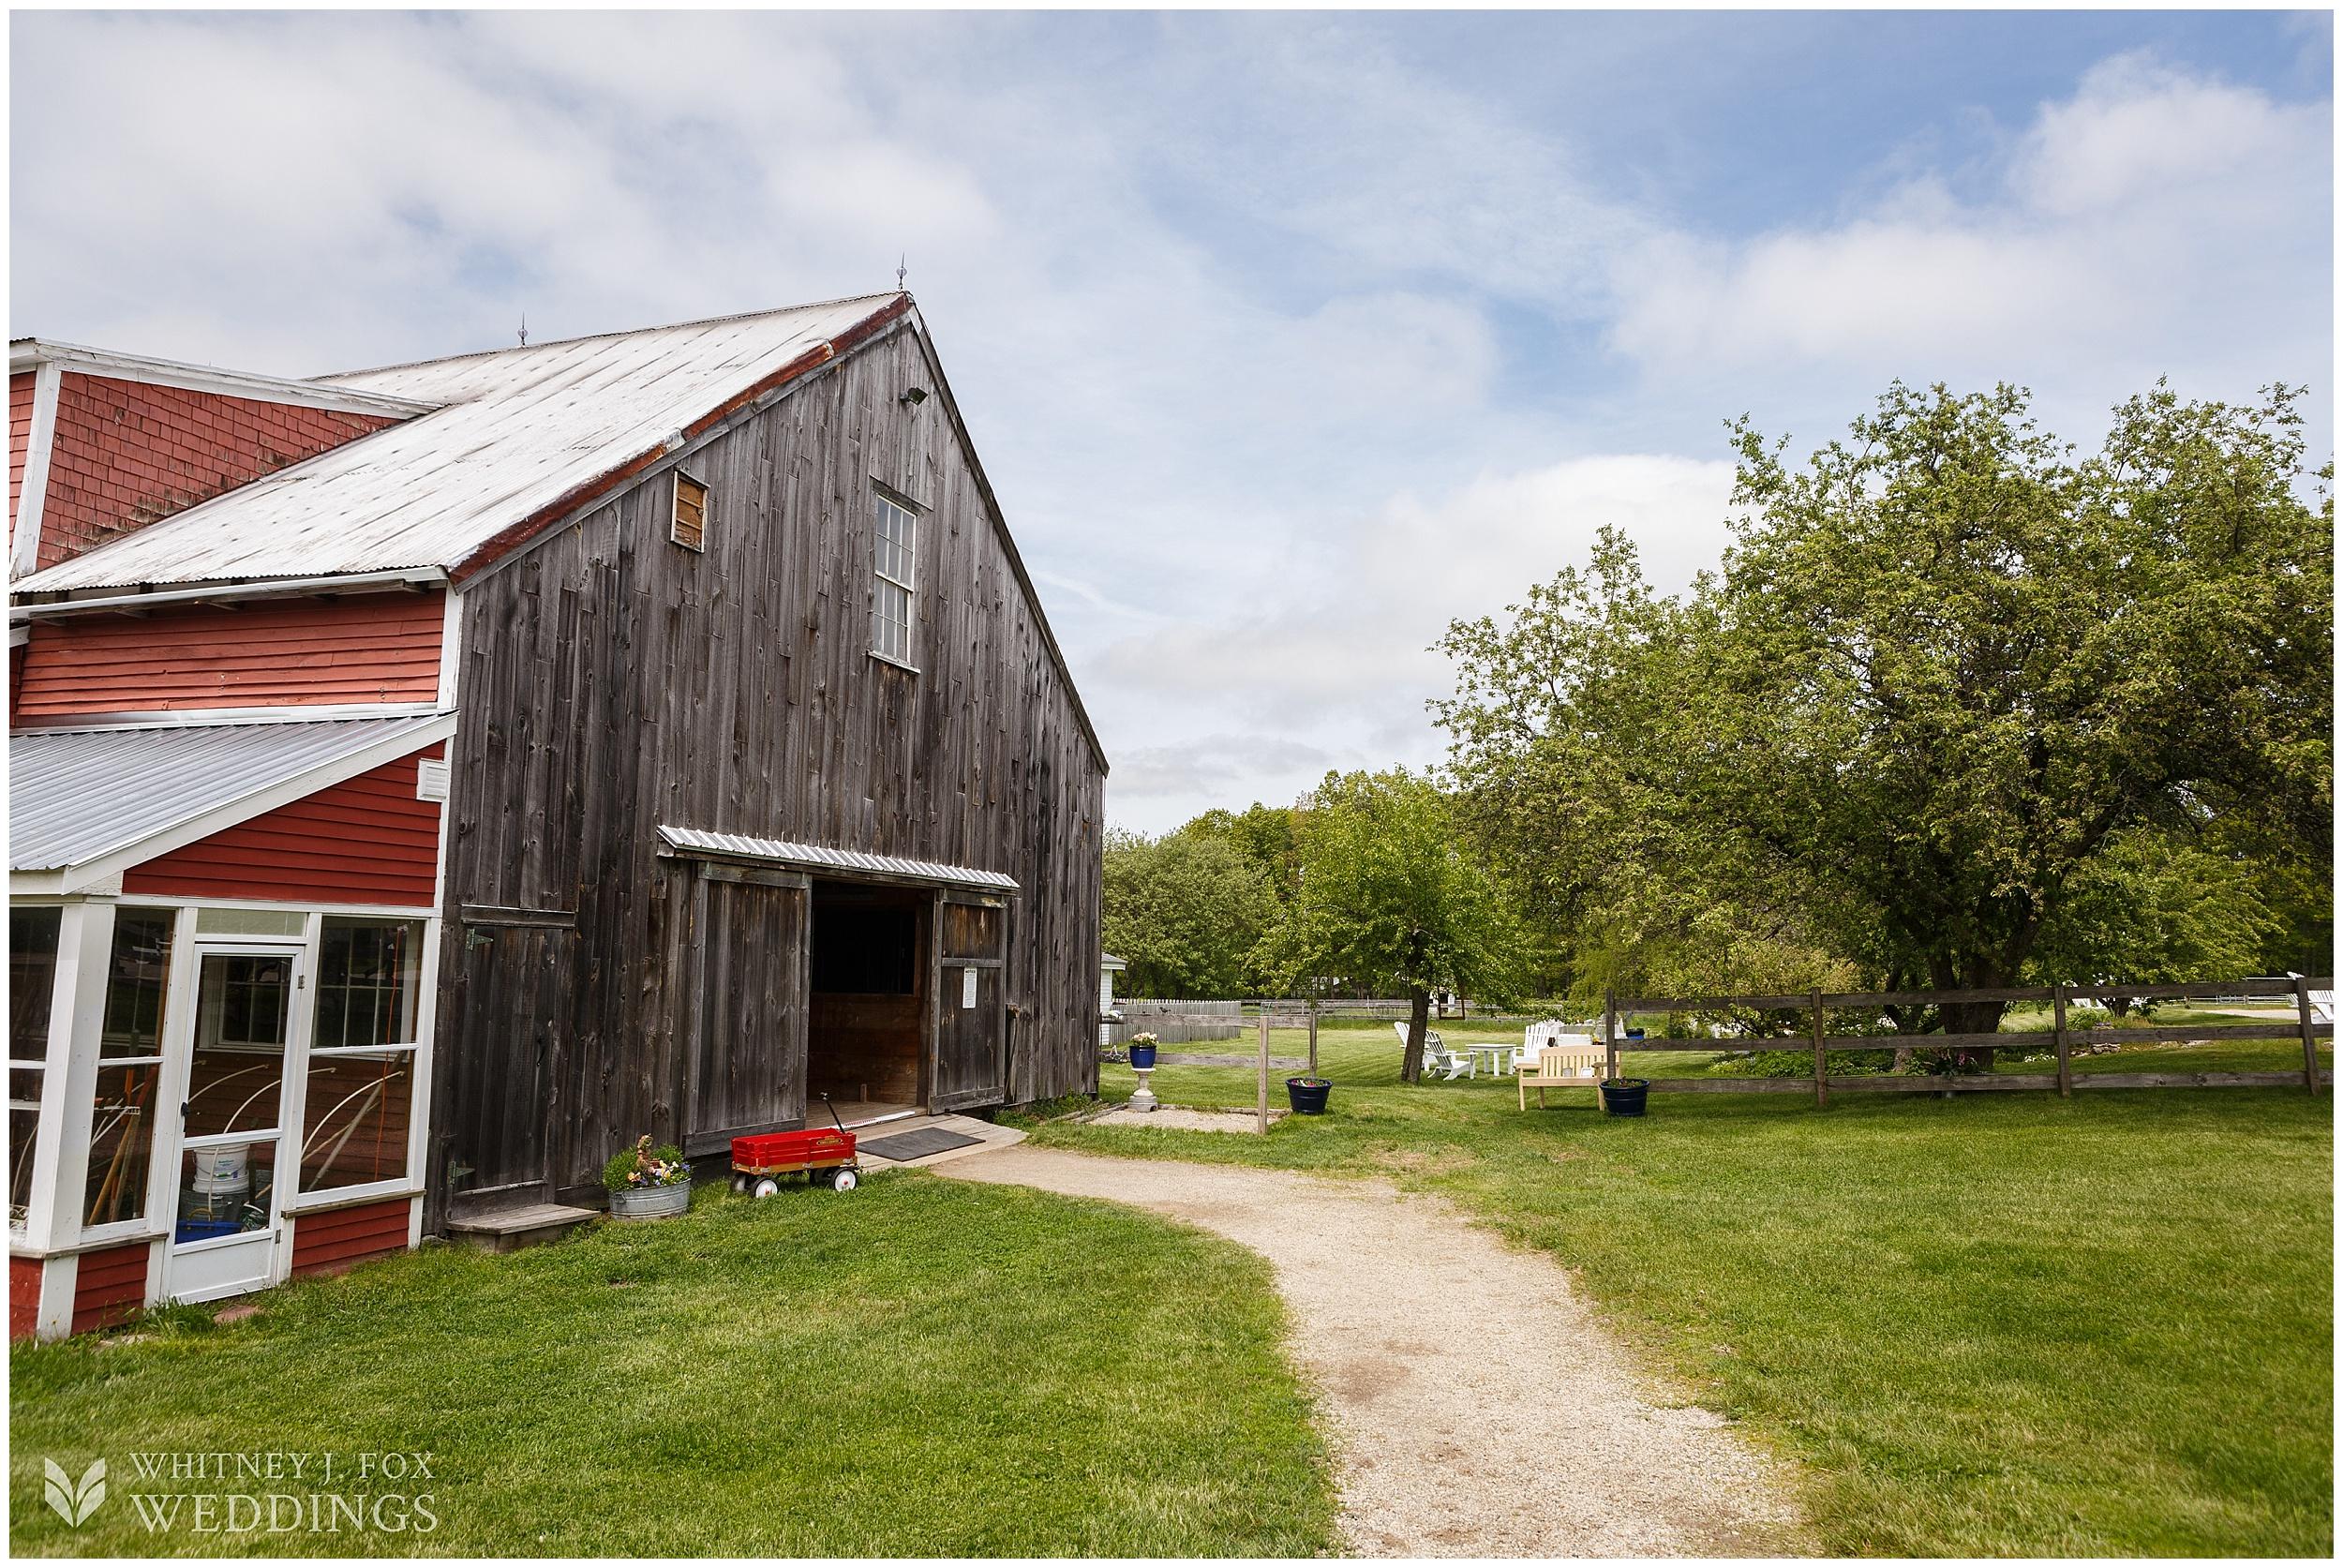 5_tai_josh_the_homestead_rest_be_thankful_farm_lyman_maine_photographer_whitney_j_fox_weddings_9226.jpg